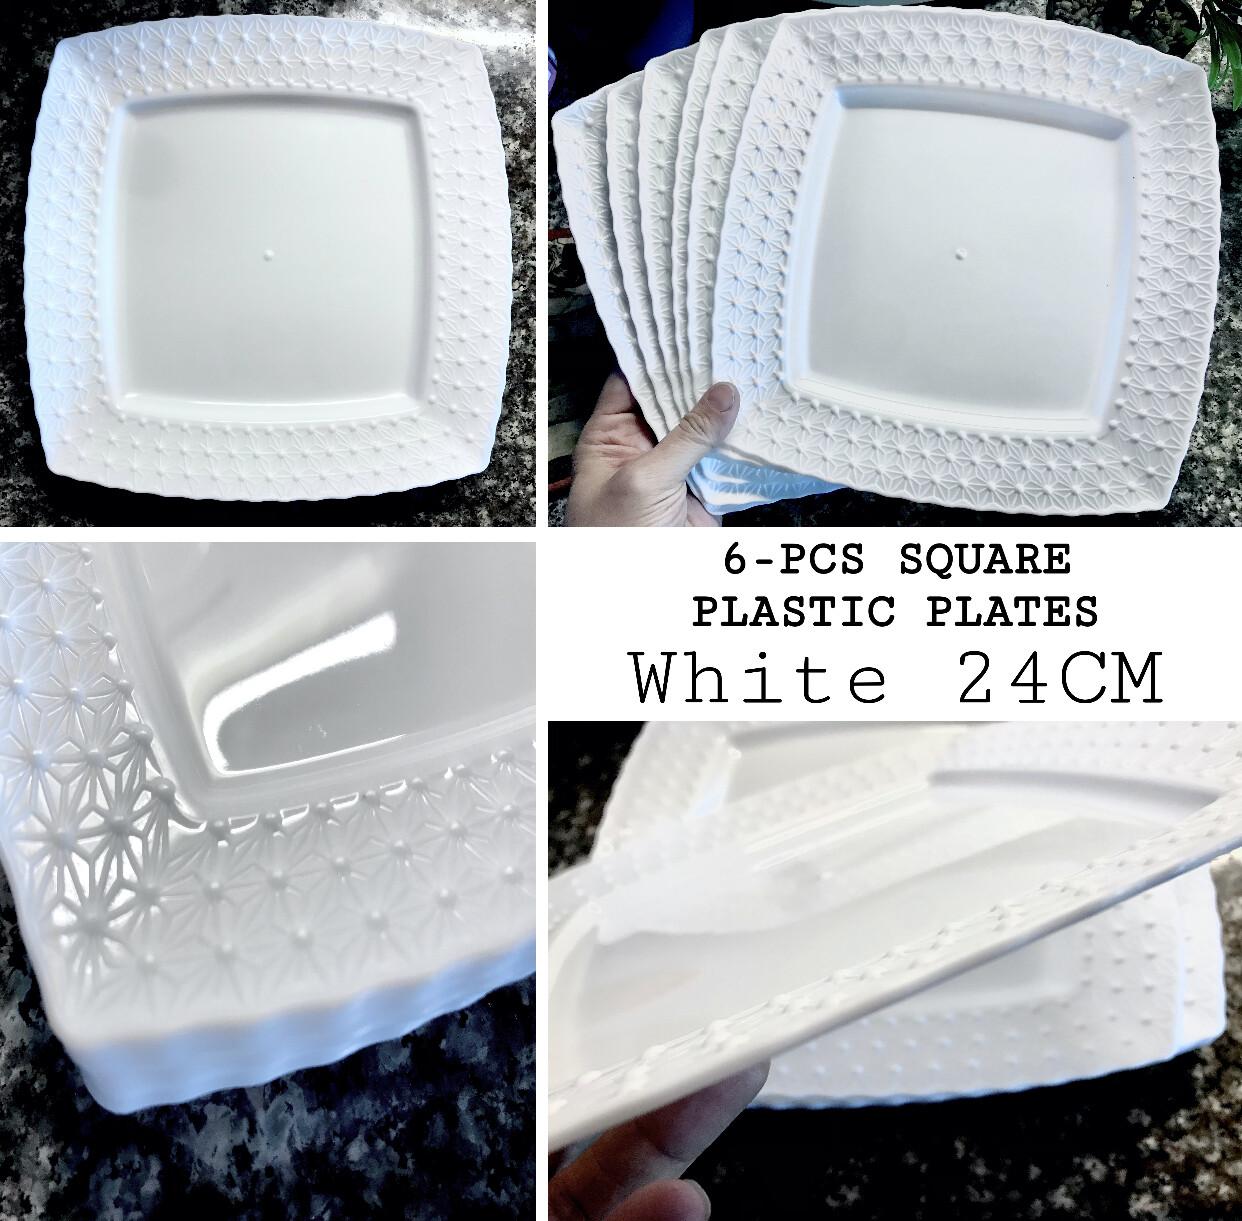 6-Pcs Plastic Plates 24cm